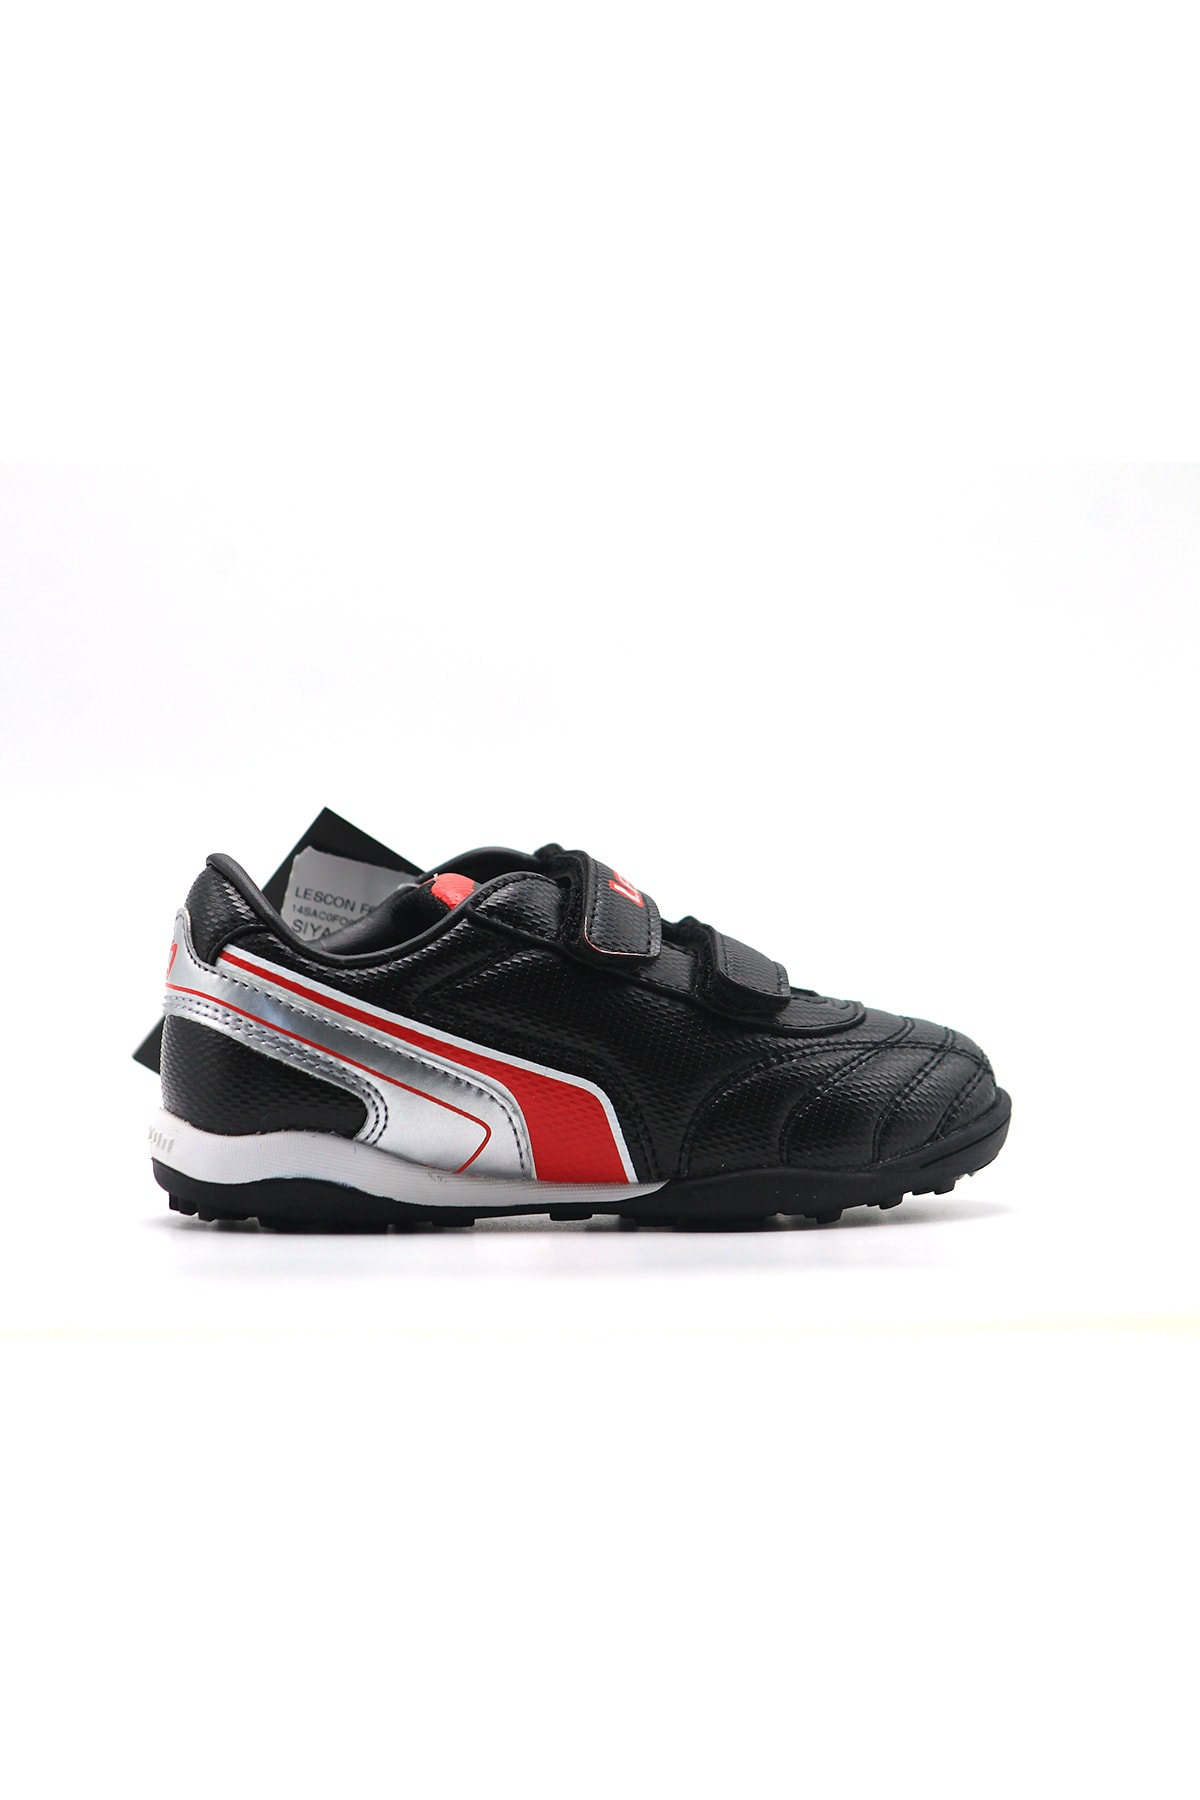 Lescon Ly-force-030 H-p-14k Futbol Ayakkabı/siyah/26 2